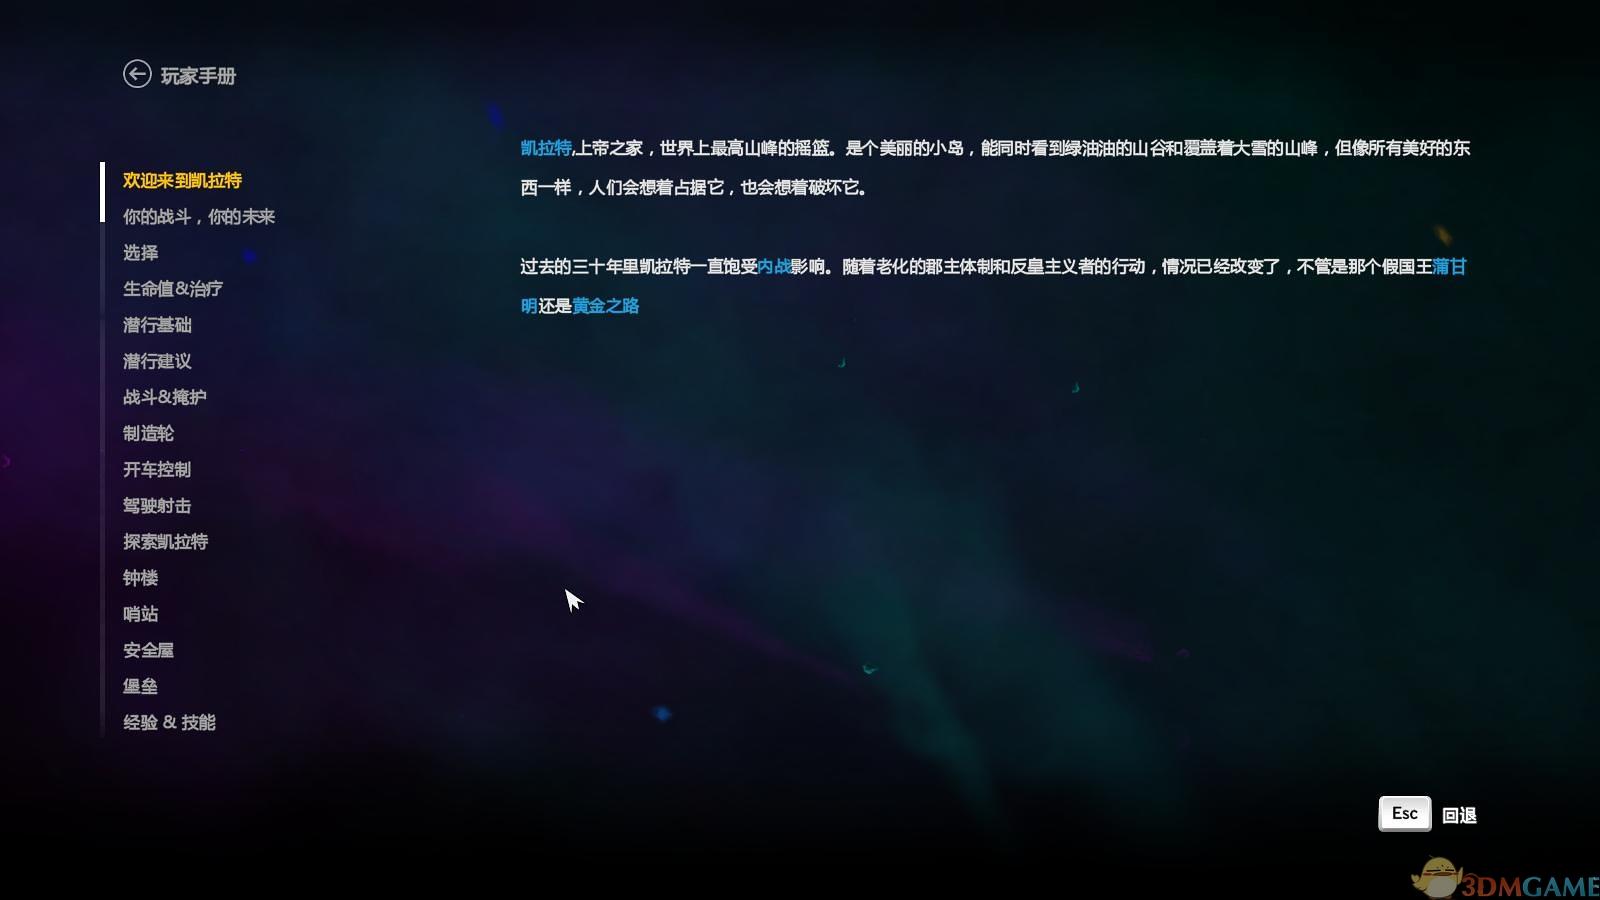 孤岛惊魂4  v1.8.0修正升级档+破解补丁[RELOADED]